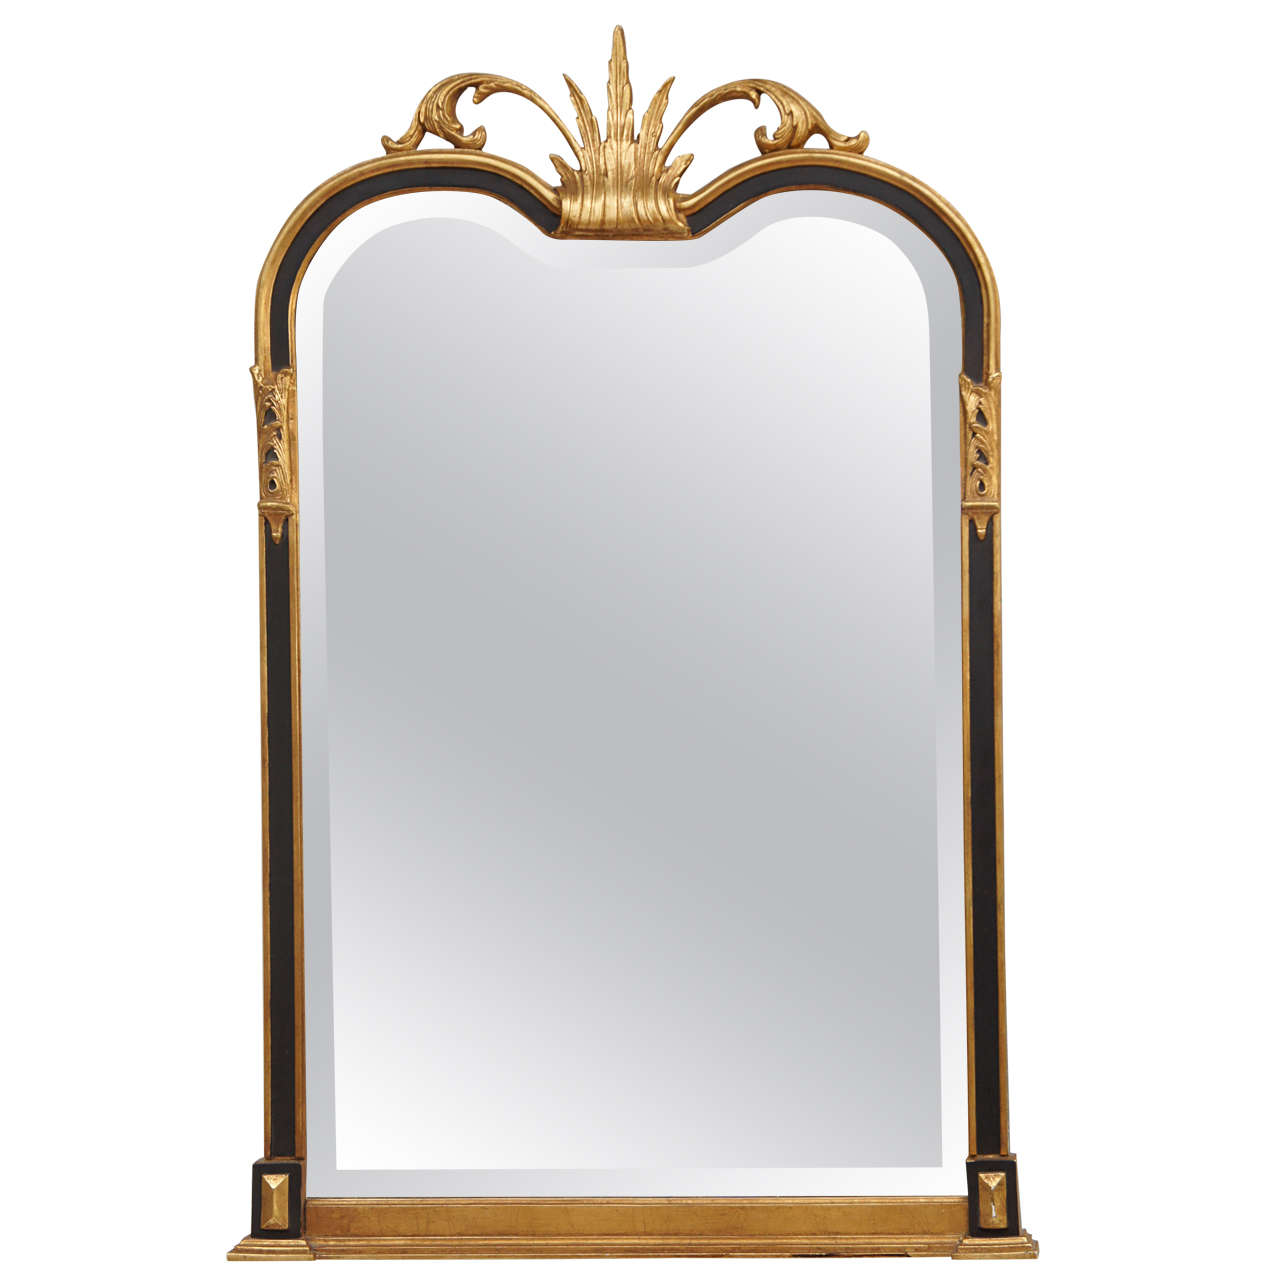 Neoclassical gilt ebonized mantel mirror at 1stdibs for Mantel mirrors